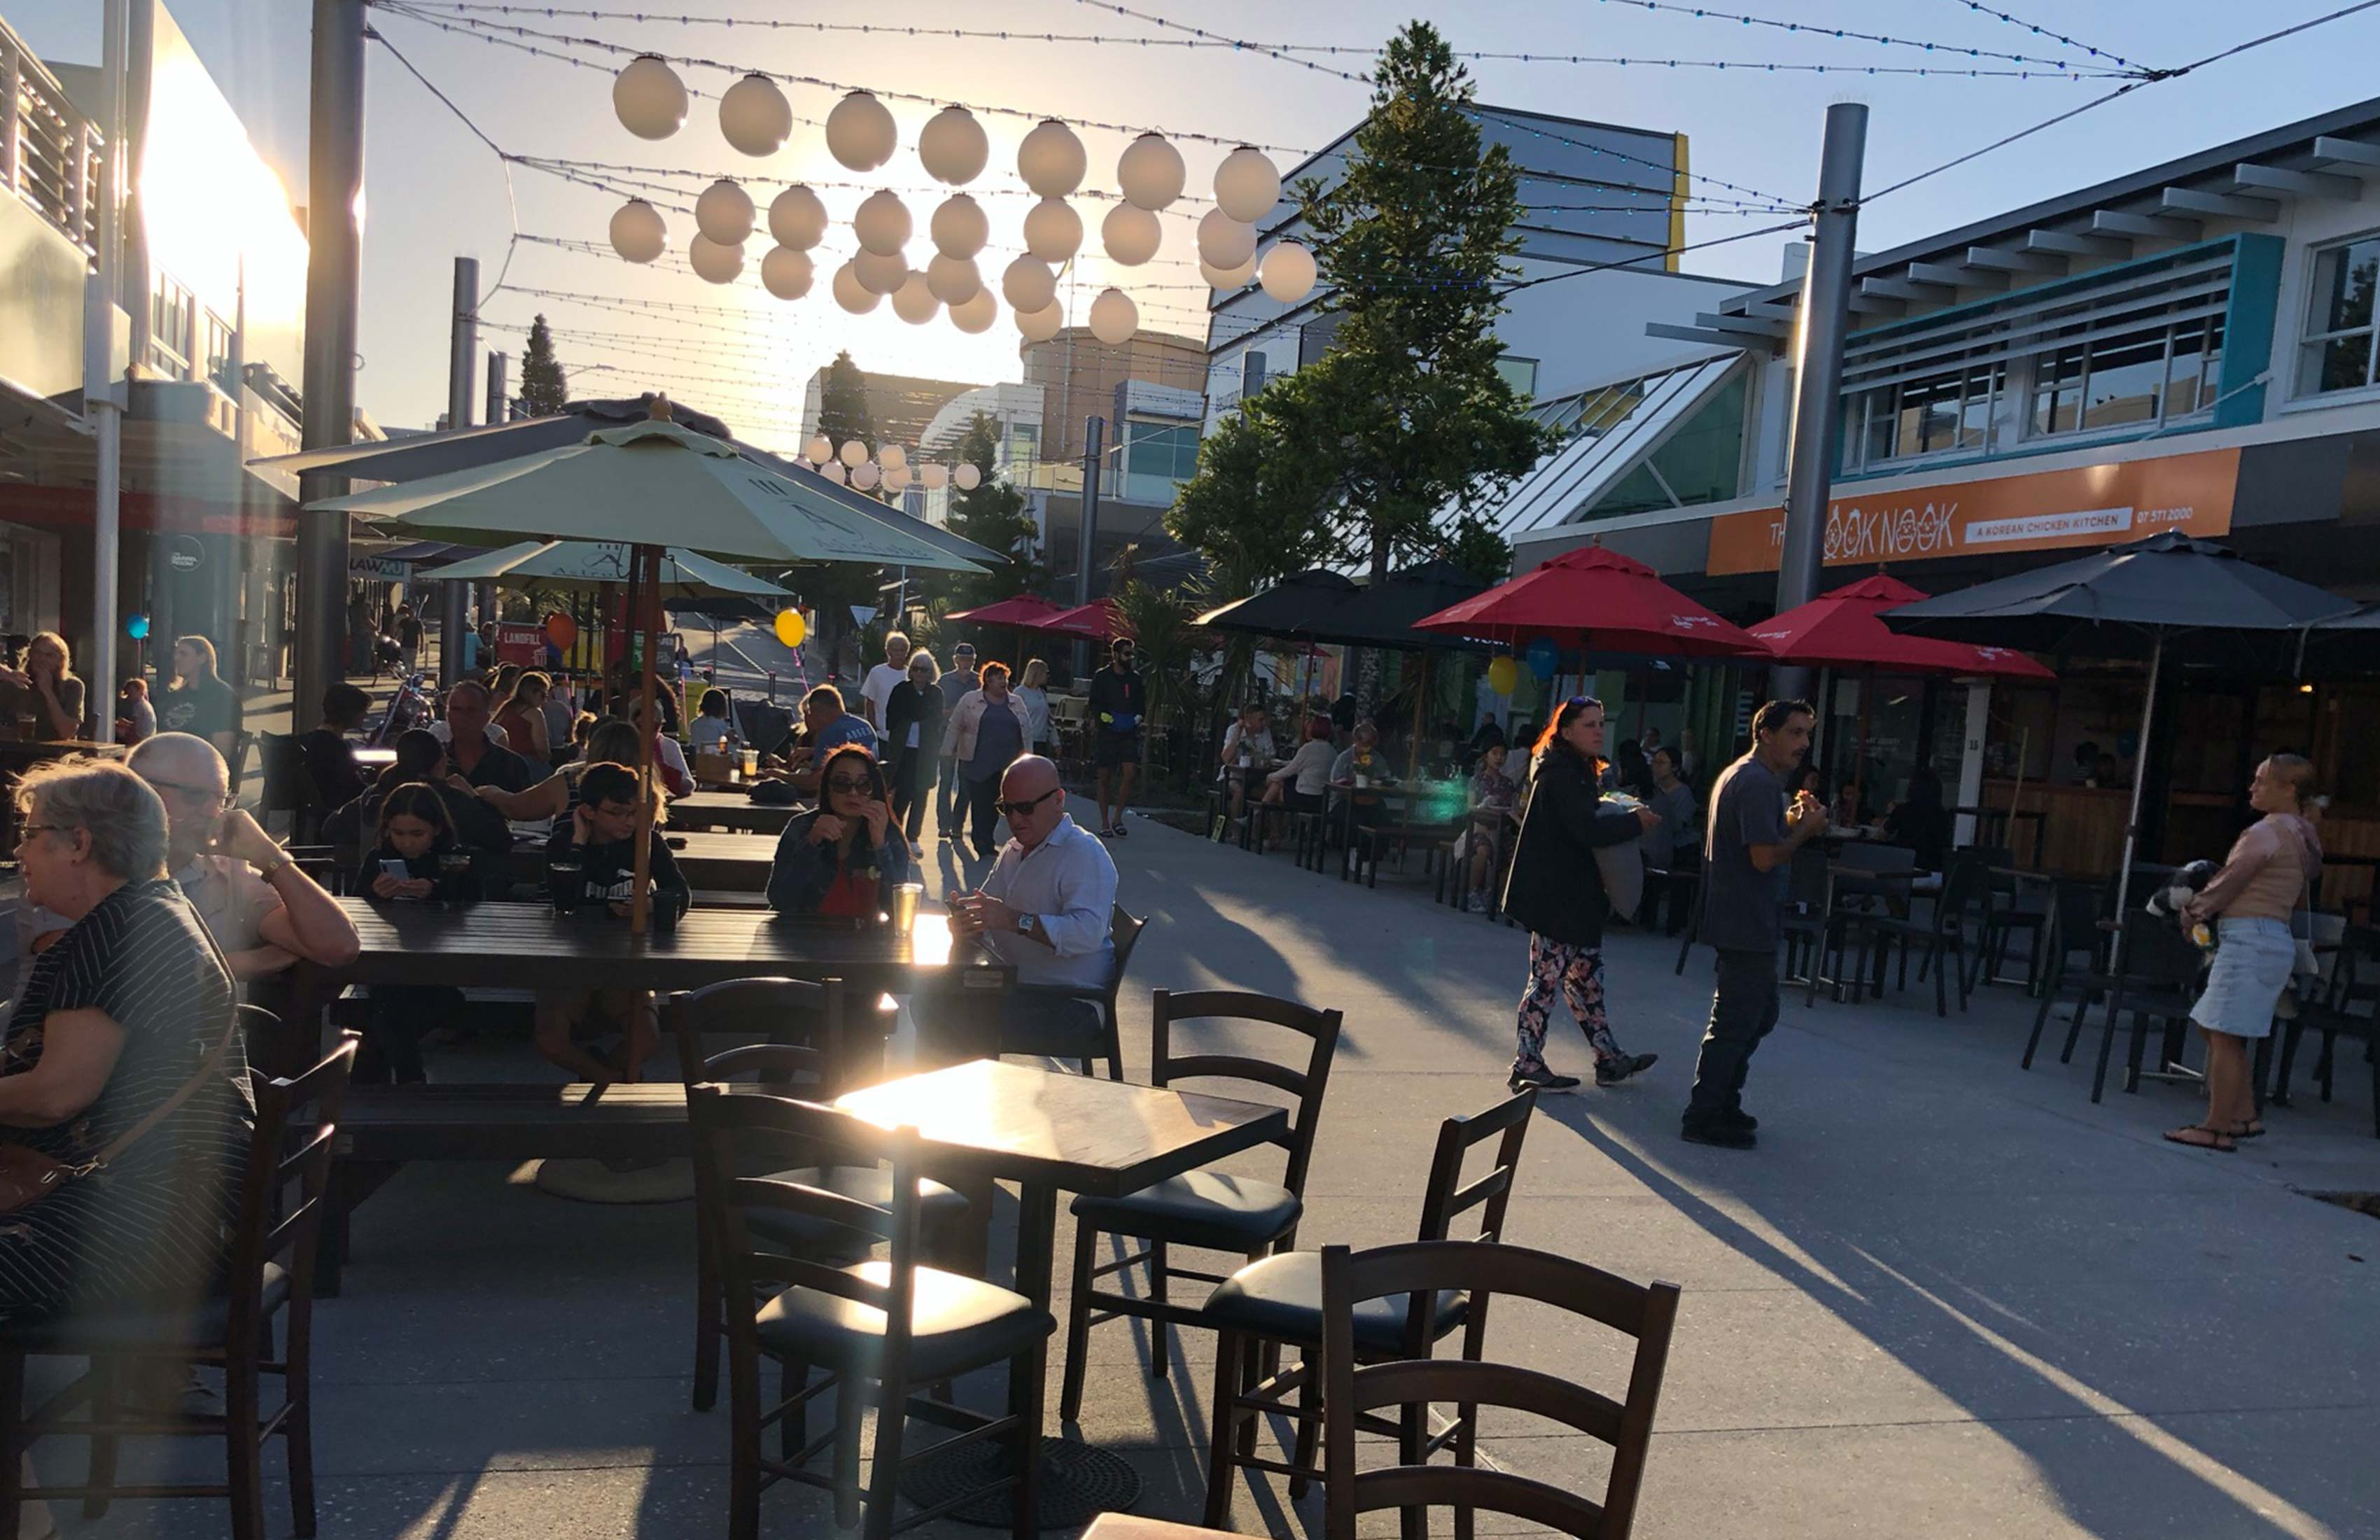 People enjoying Friday night on Warf Street, Tauranga